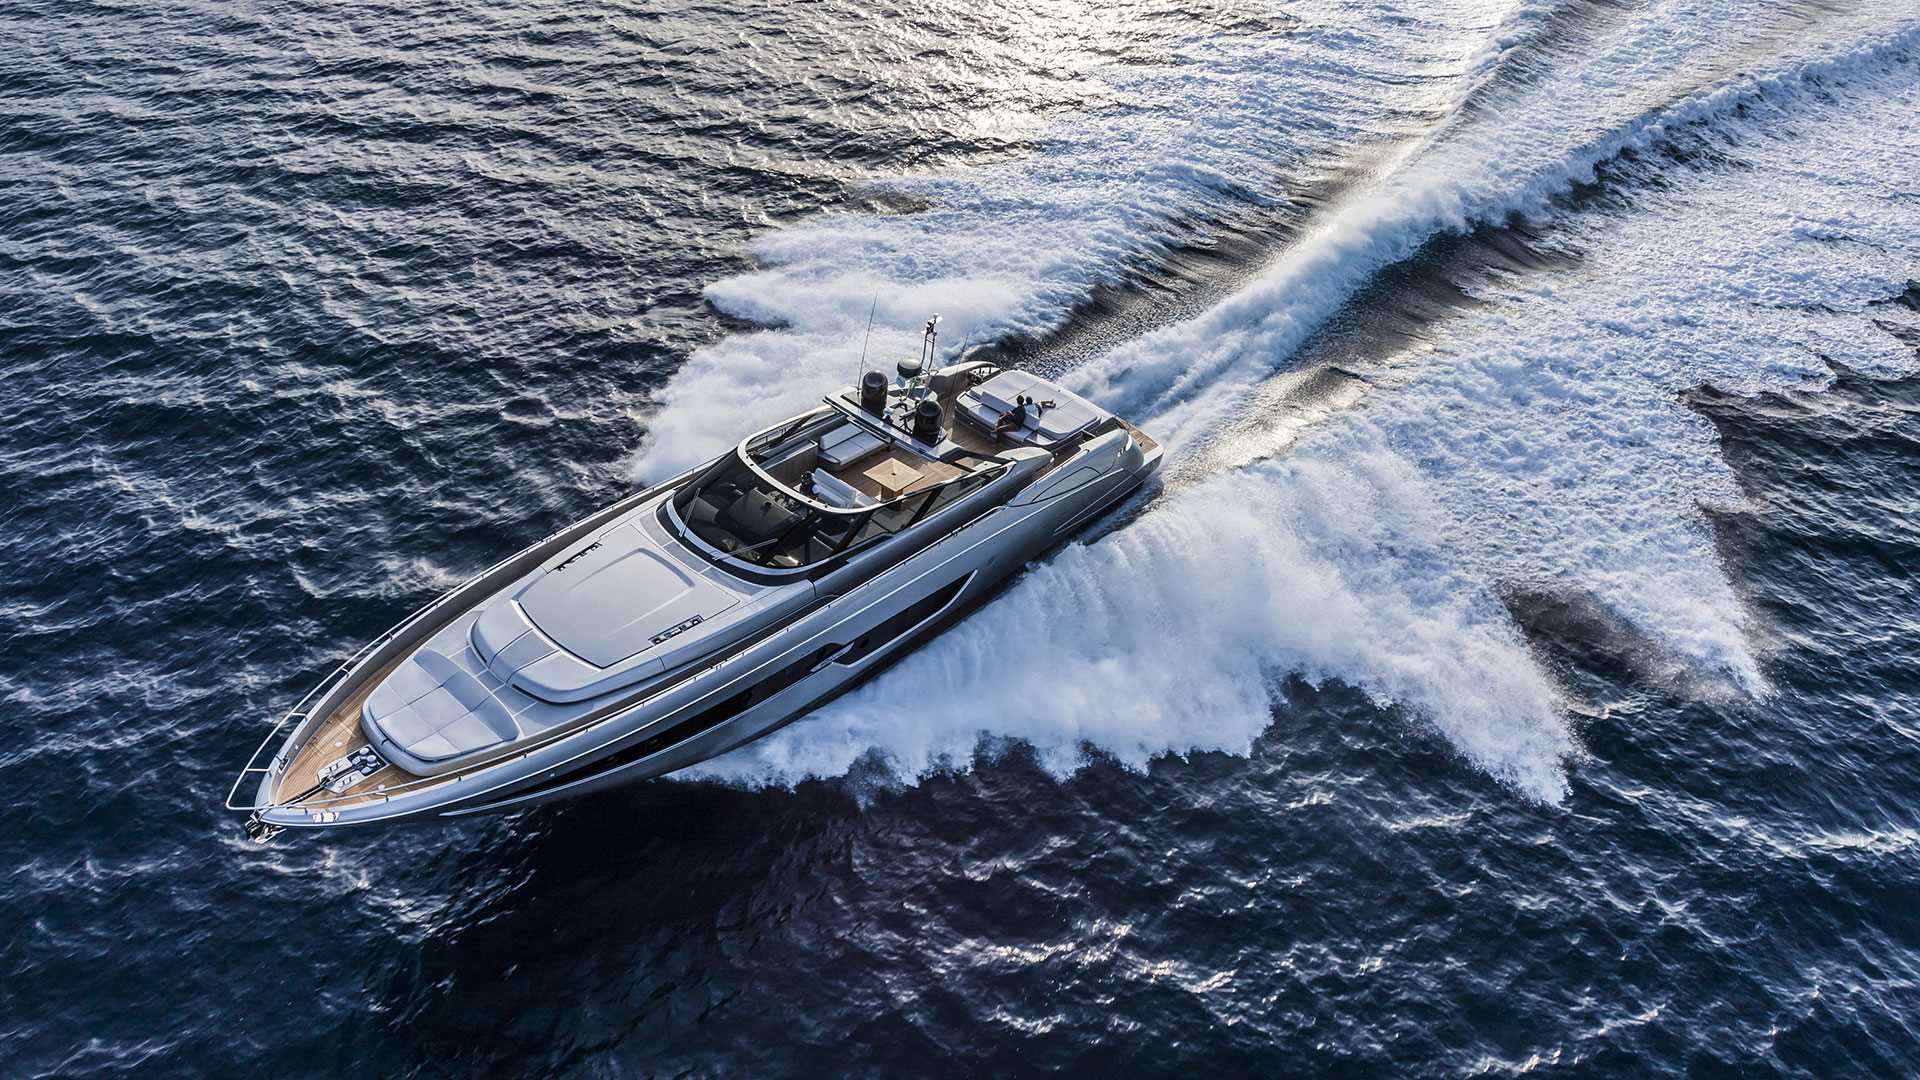 Riva 88 Florida luxusní člun